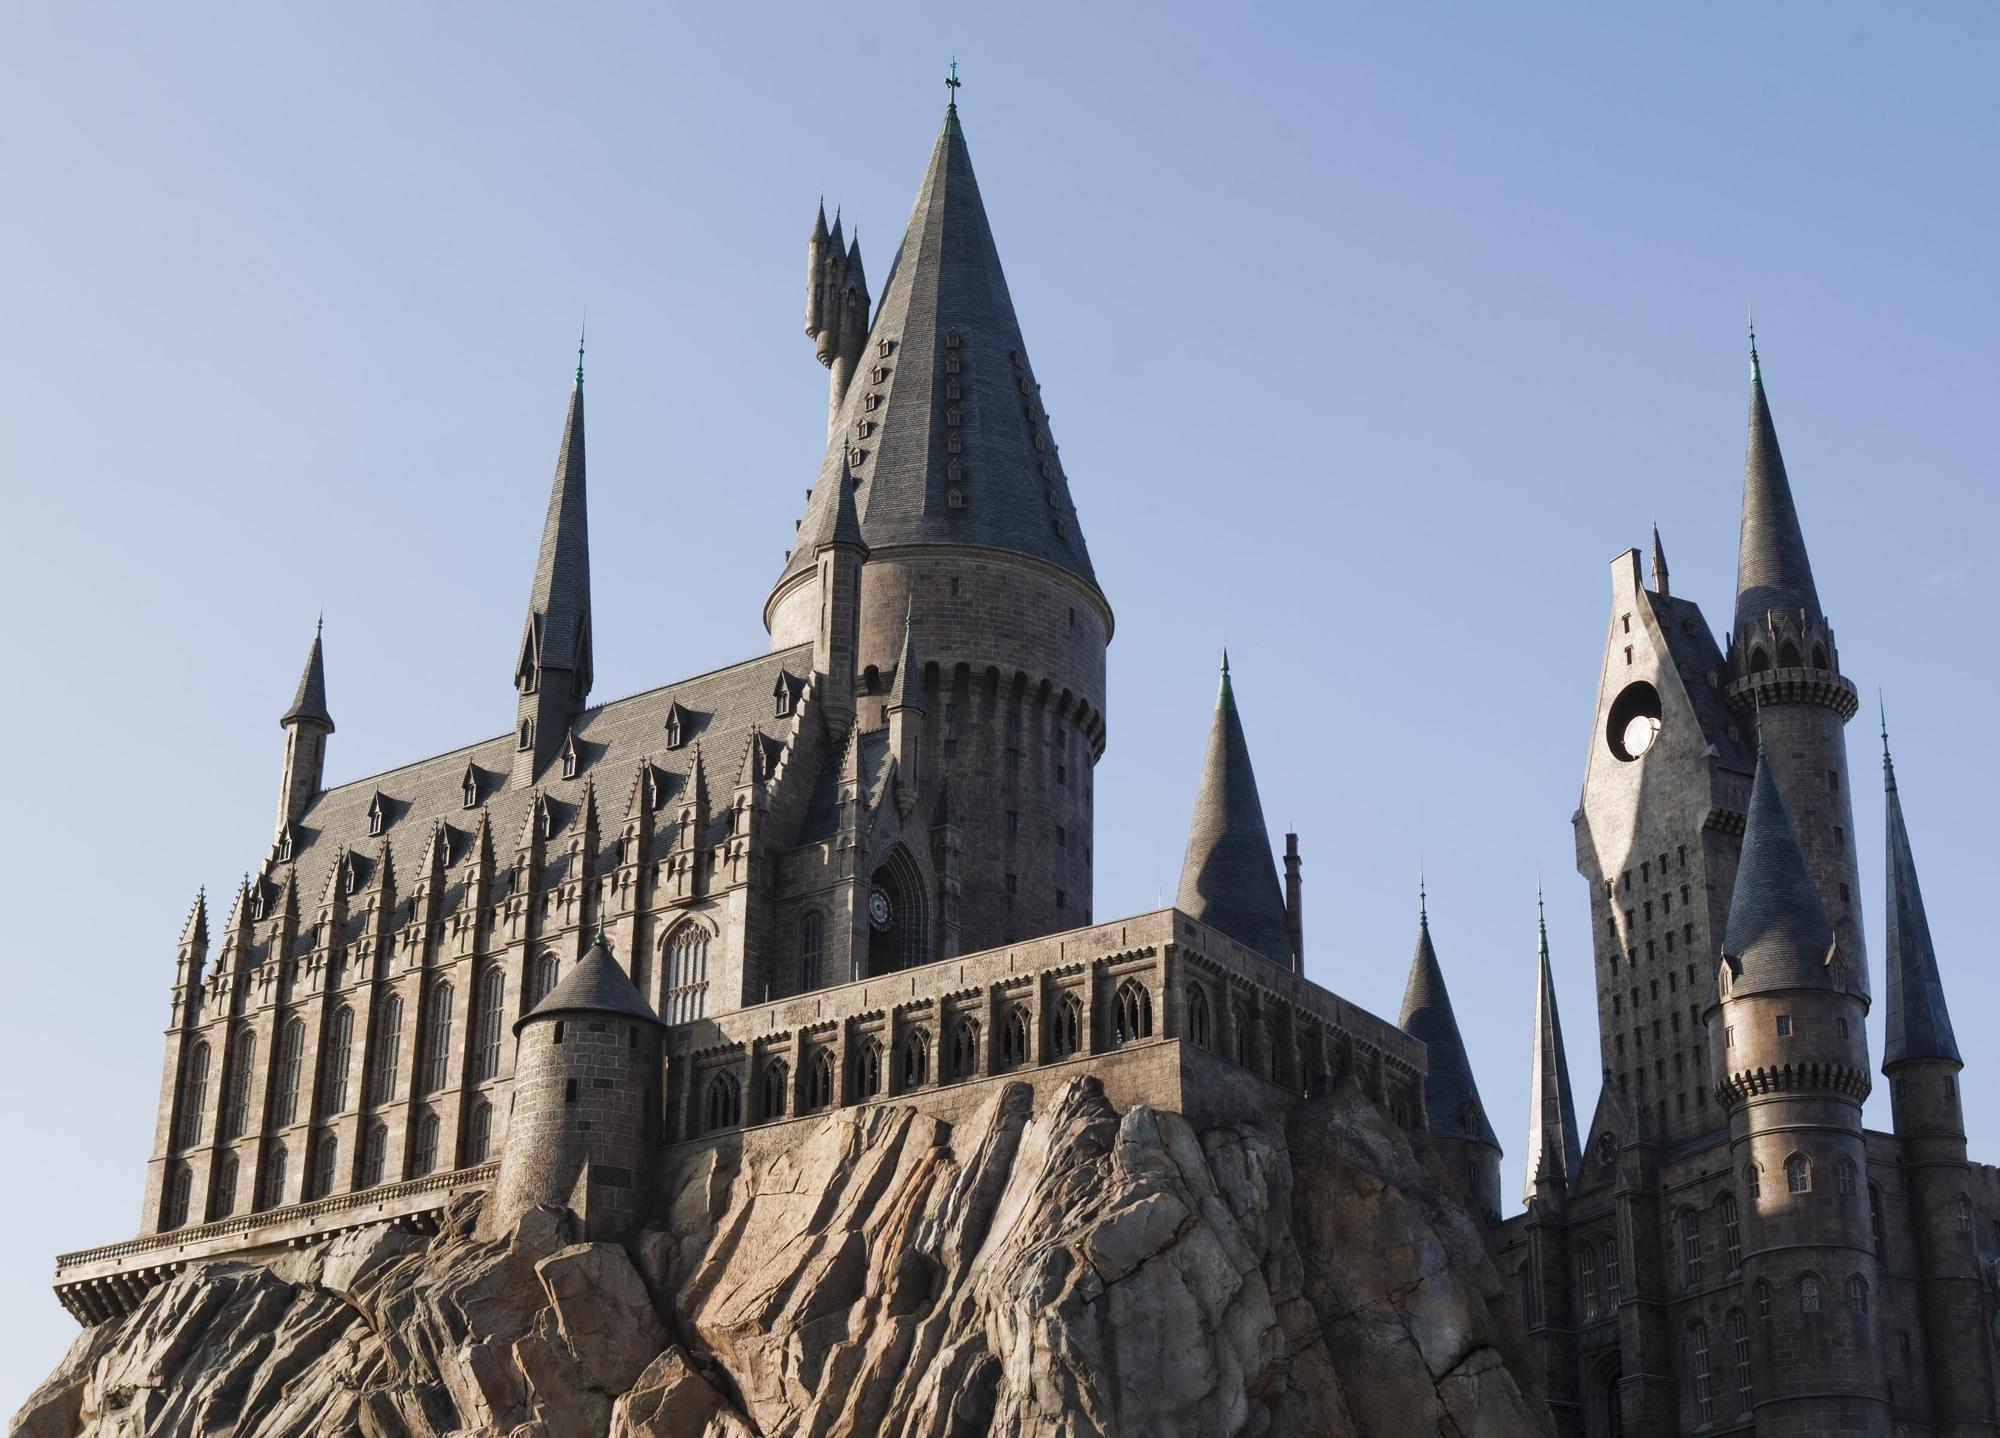 Where is Hogwarts